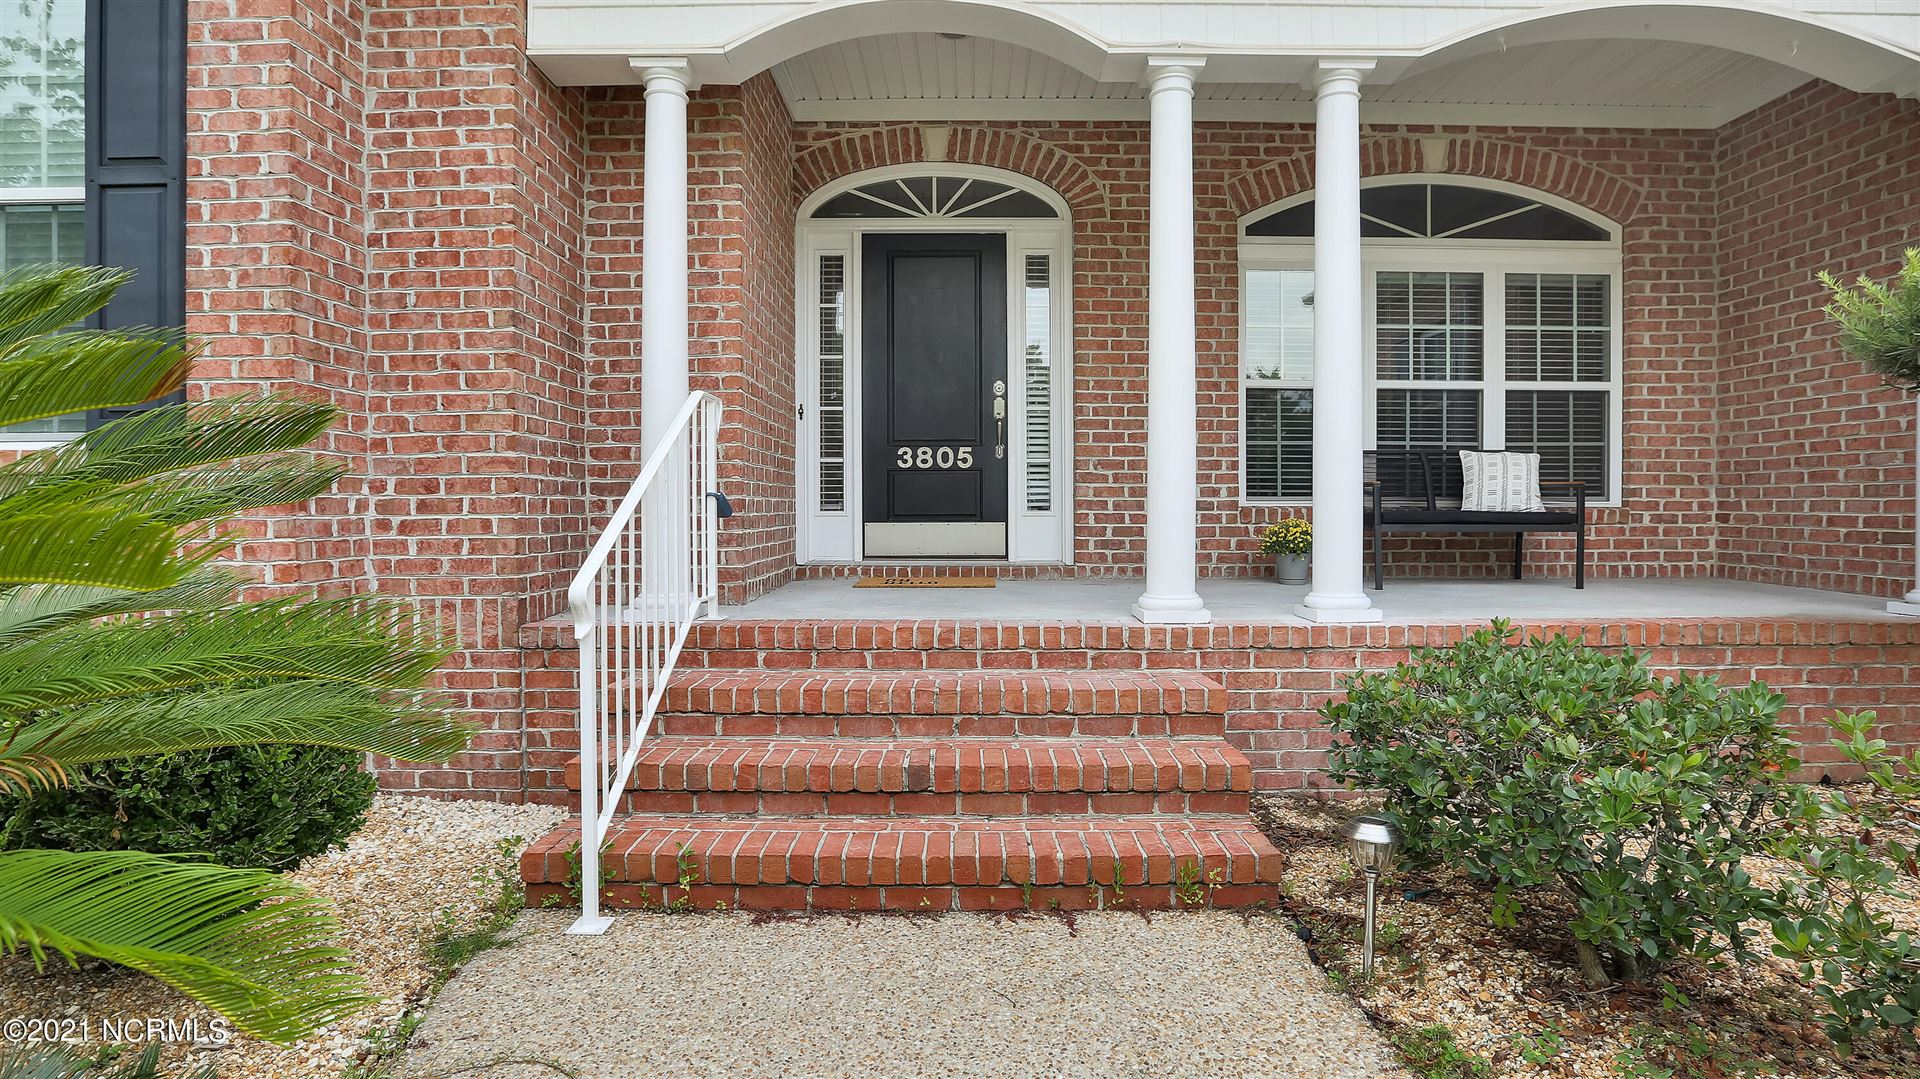 Photo of 3805 Ardley Court, Wilmington, NC 28409 (MLS # 100289925)